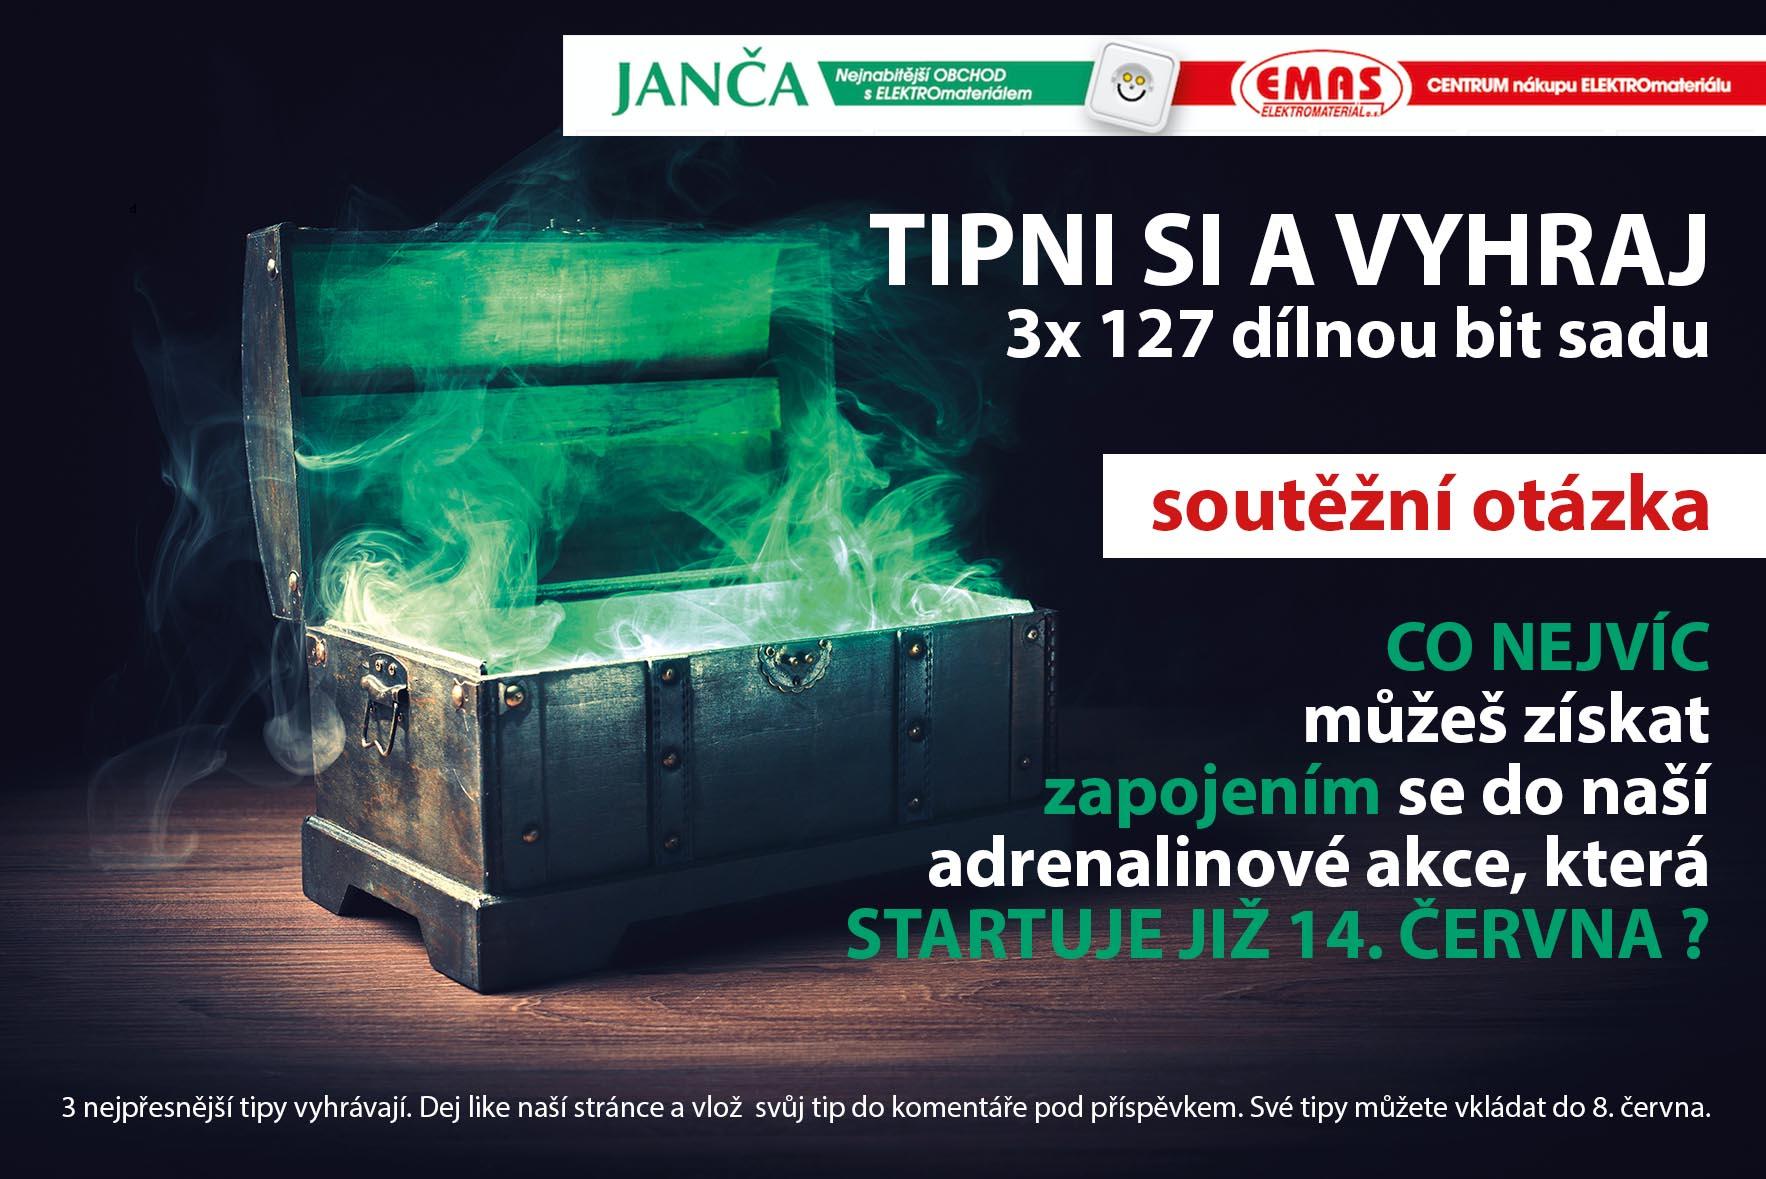 TIPNI SI A VYHRAJ 127 dílnou sadu bitů od NAREX - www.jancaelektro.cz